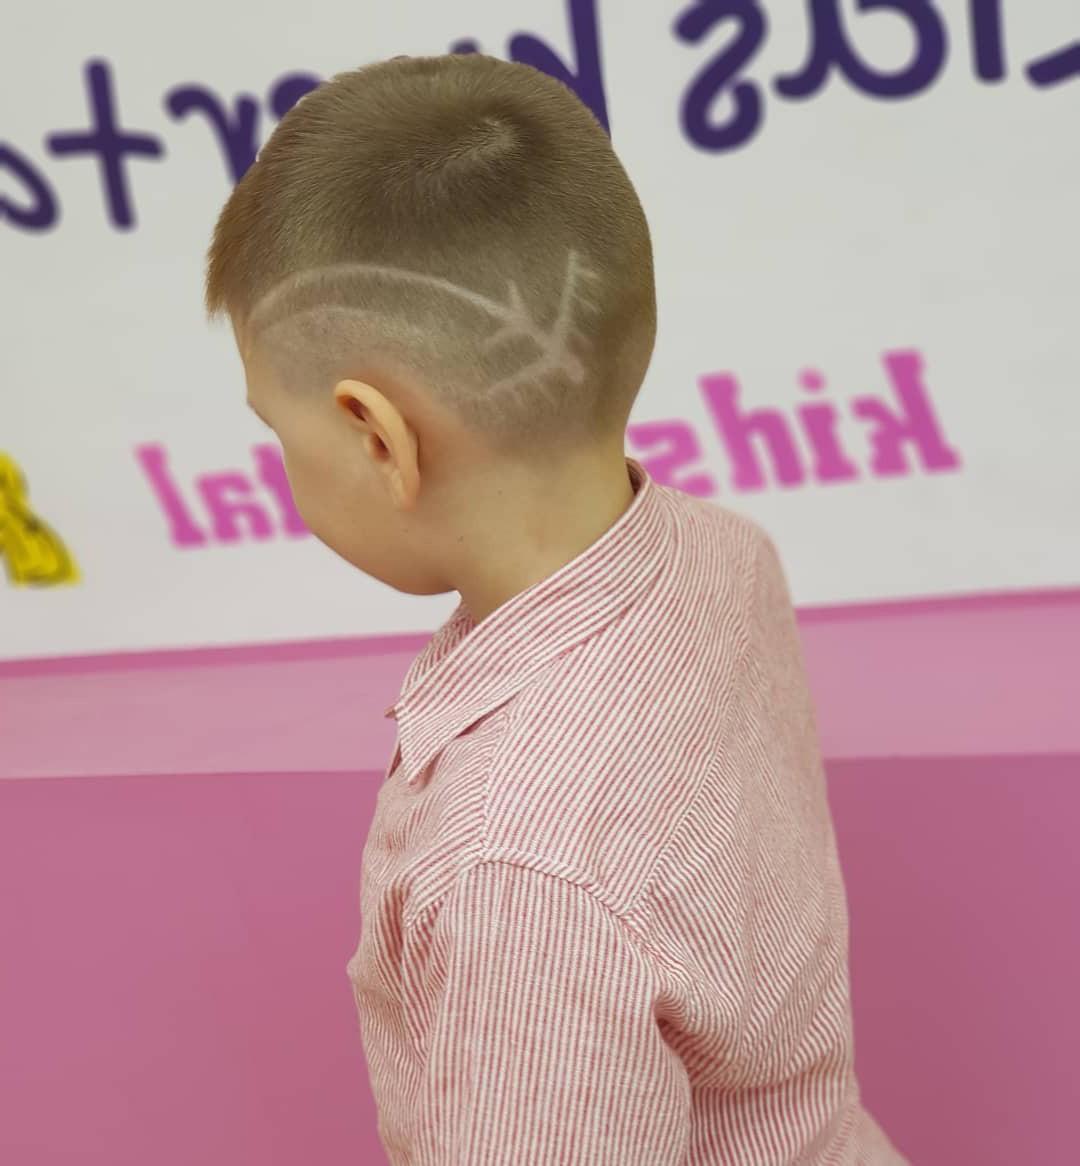 Toddler Boy Dive Plane Fade Undercut Hairstyle